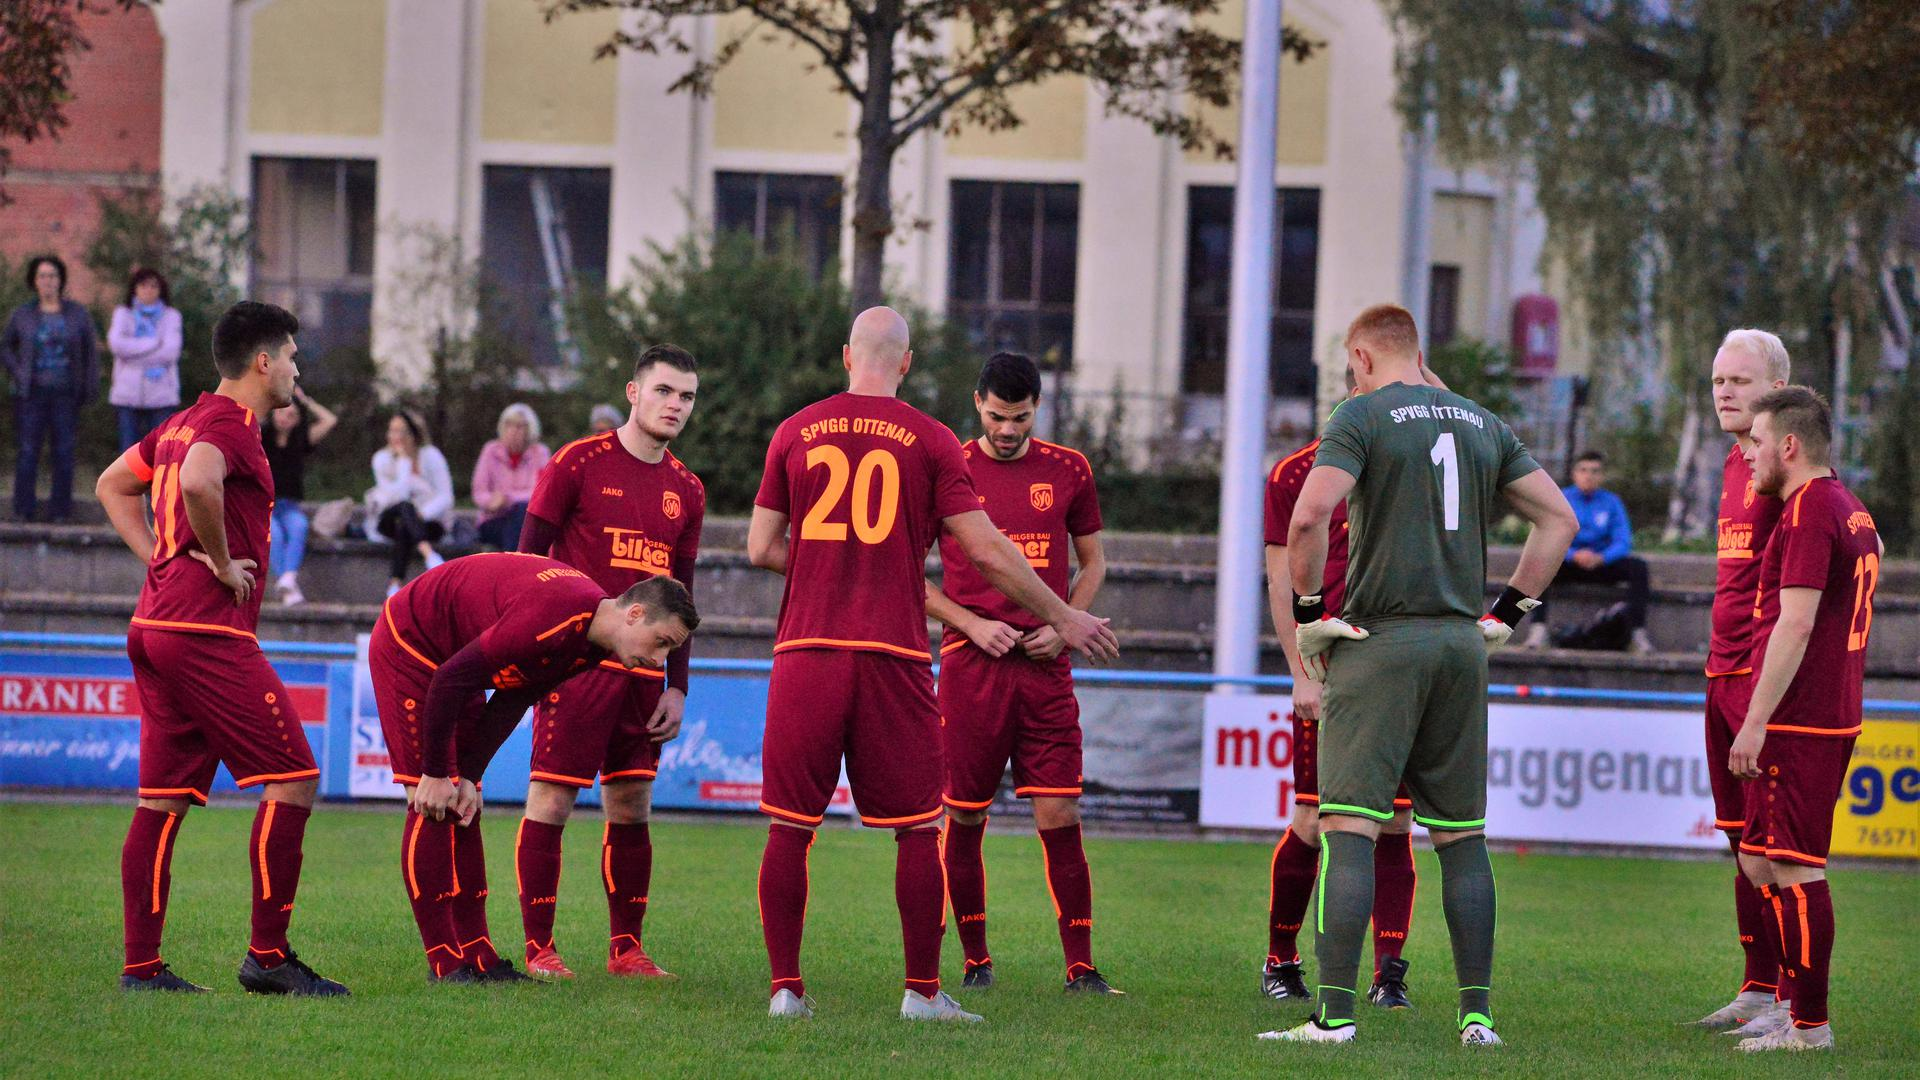 Fußball-Bezirksliga 2020/21, Spvgg Ottenau